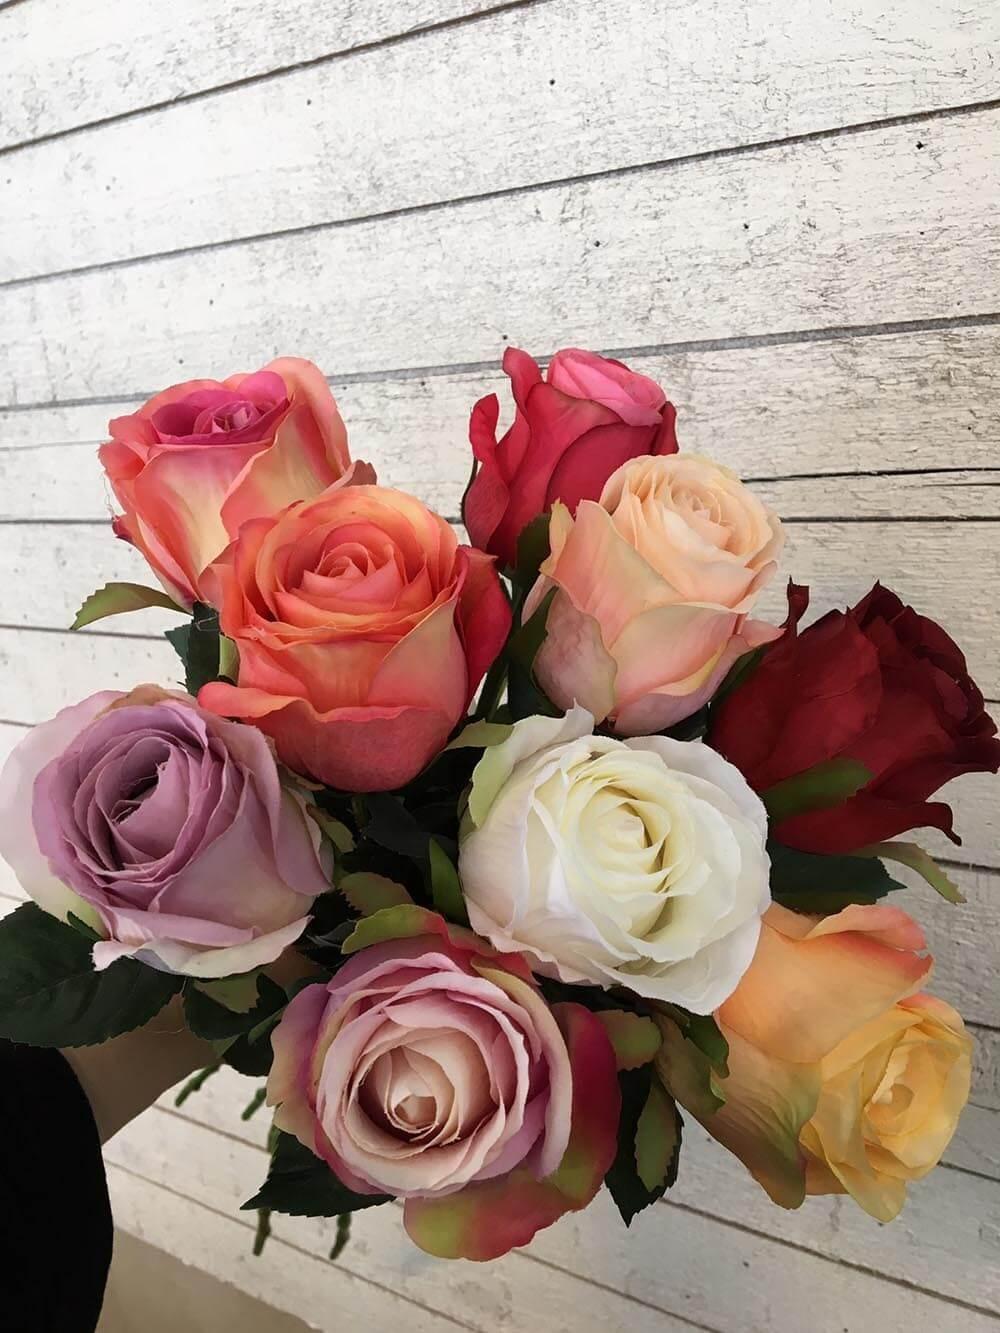 Ros, aprikos, konstgjord blomma